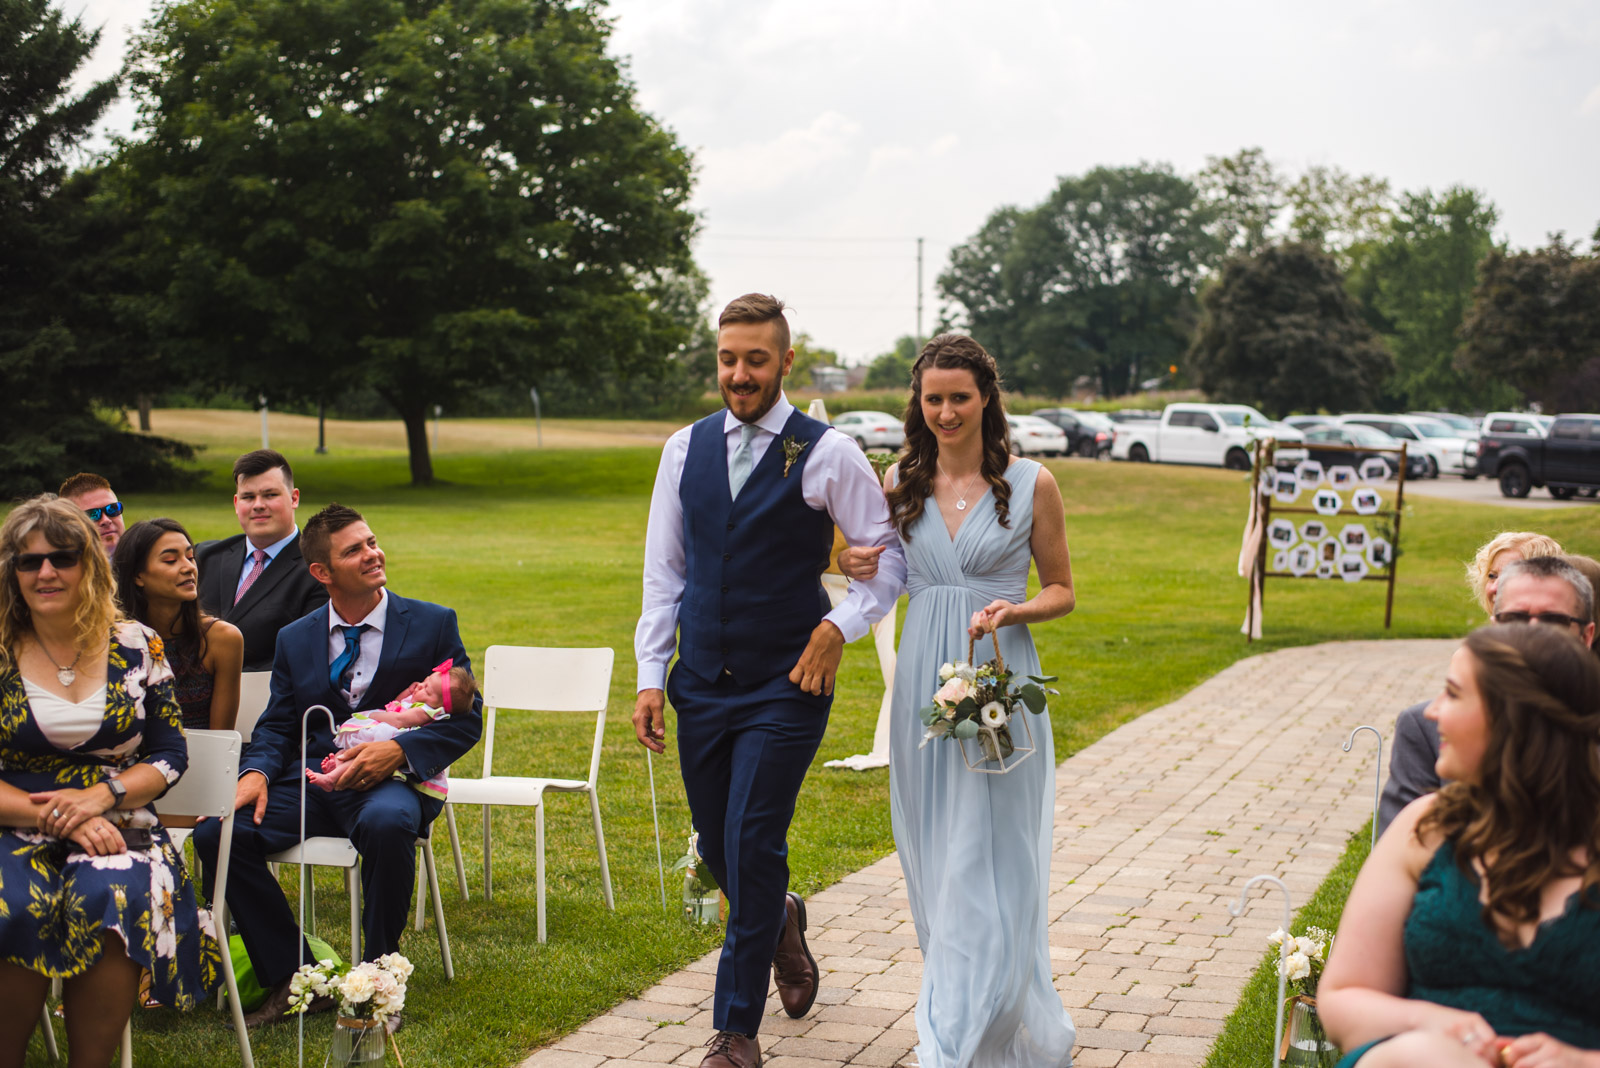 Emerson & Elicia's Golf Course Wedding Aidan & Leanne Hennebry Hamilton Wedding Videographers Photographers Niagara Hush Hush Photography & Film-15.jpg